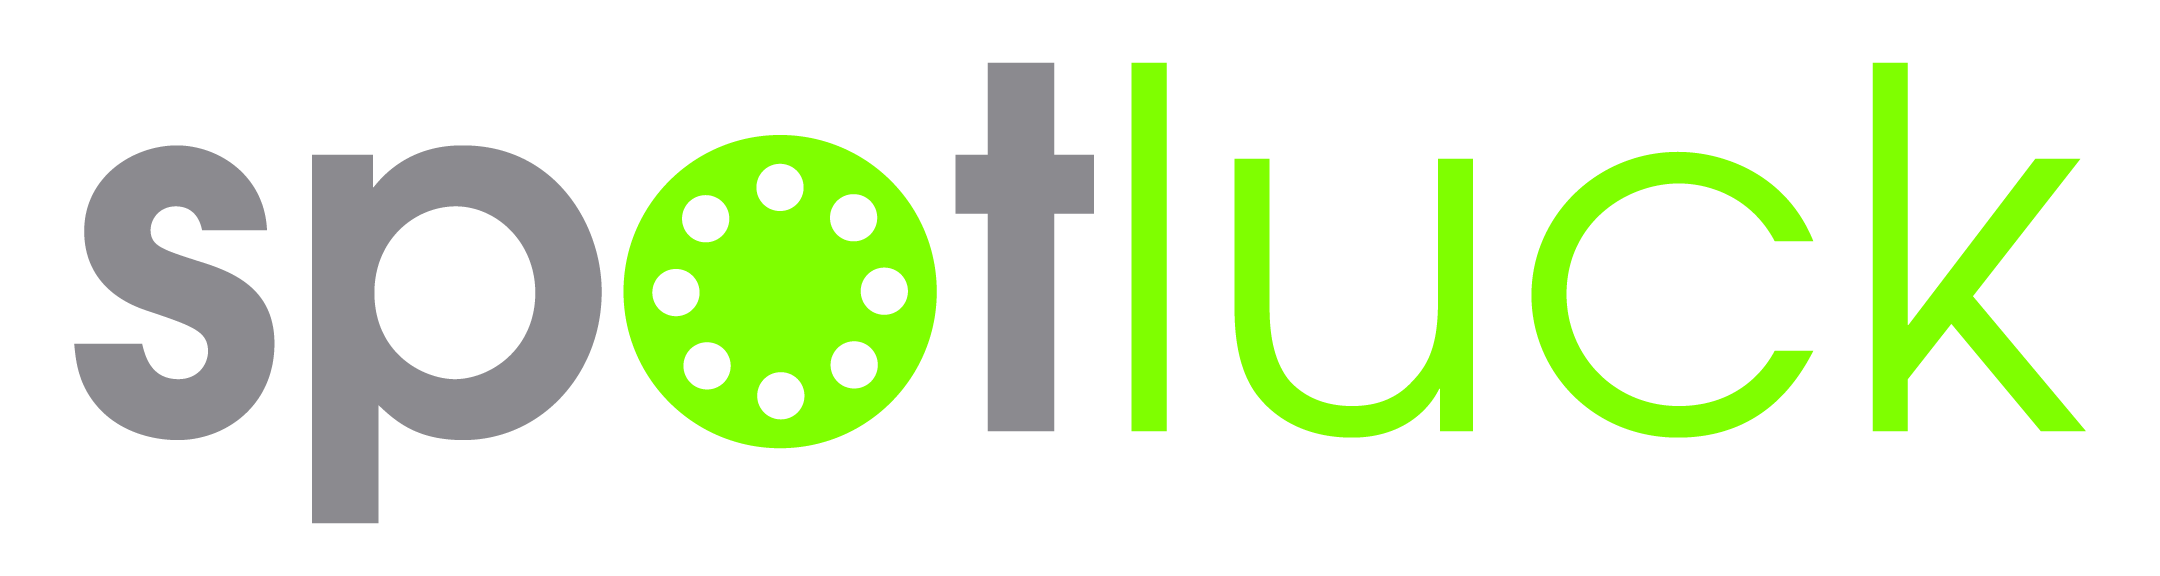 Spotluck Logo